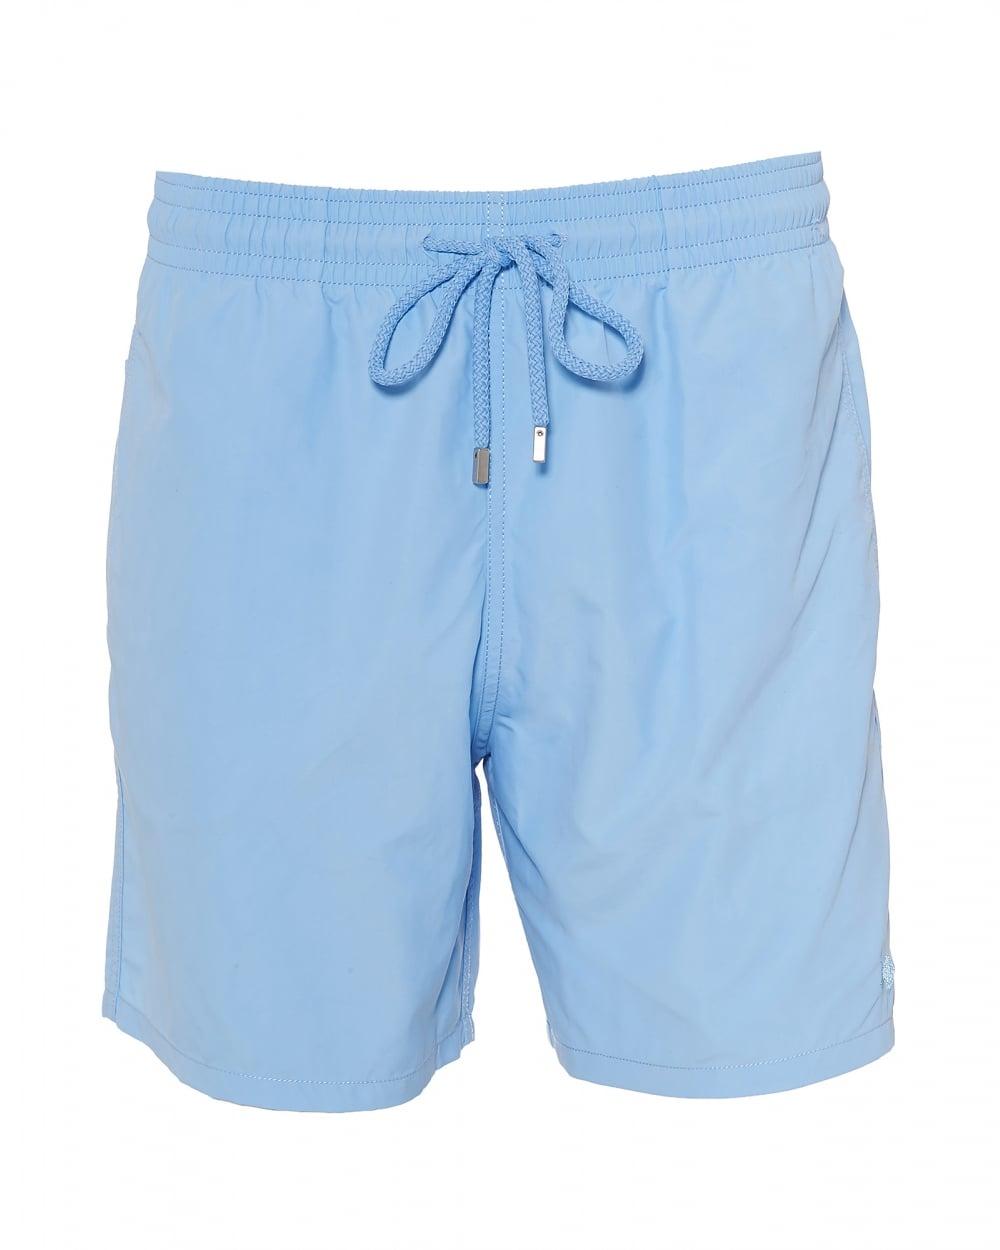 58c9dbb137 Vilebrequin Mens Moorea Swim Shorts, Water Reactive Blue Swimming Trun